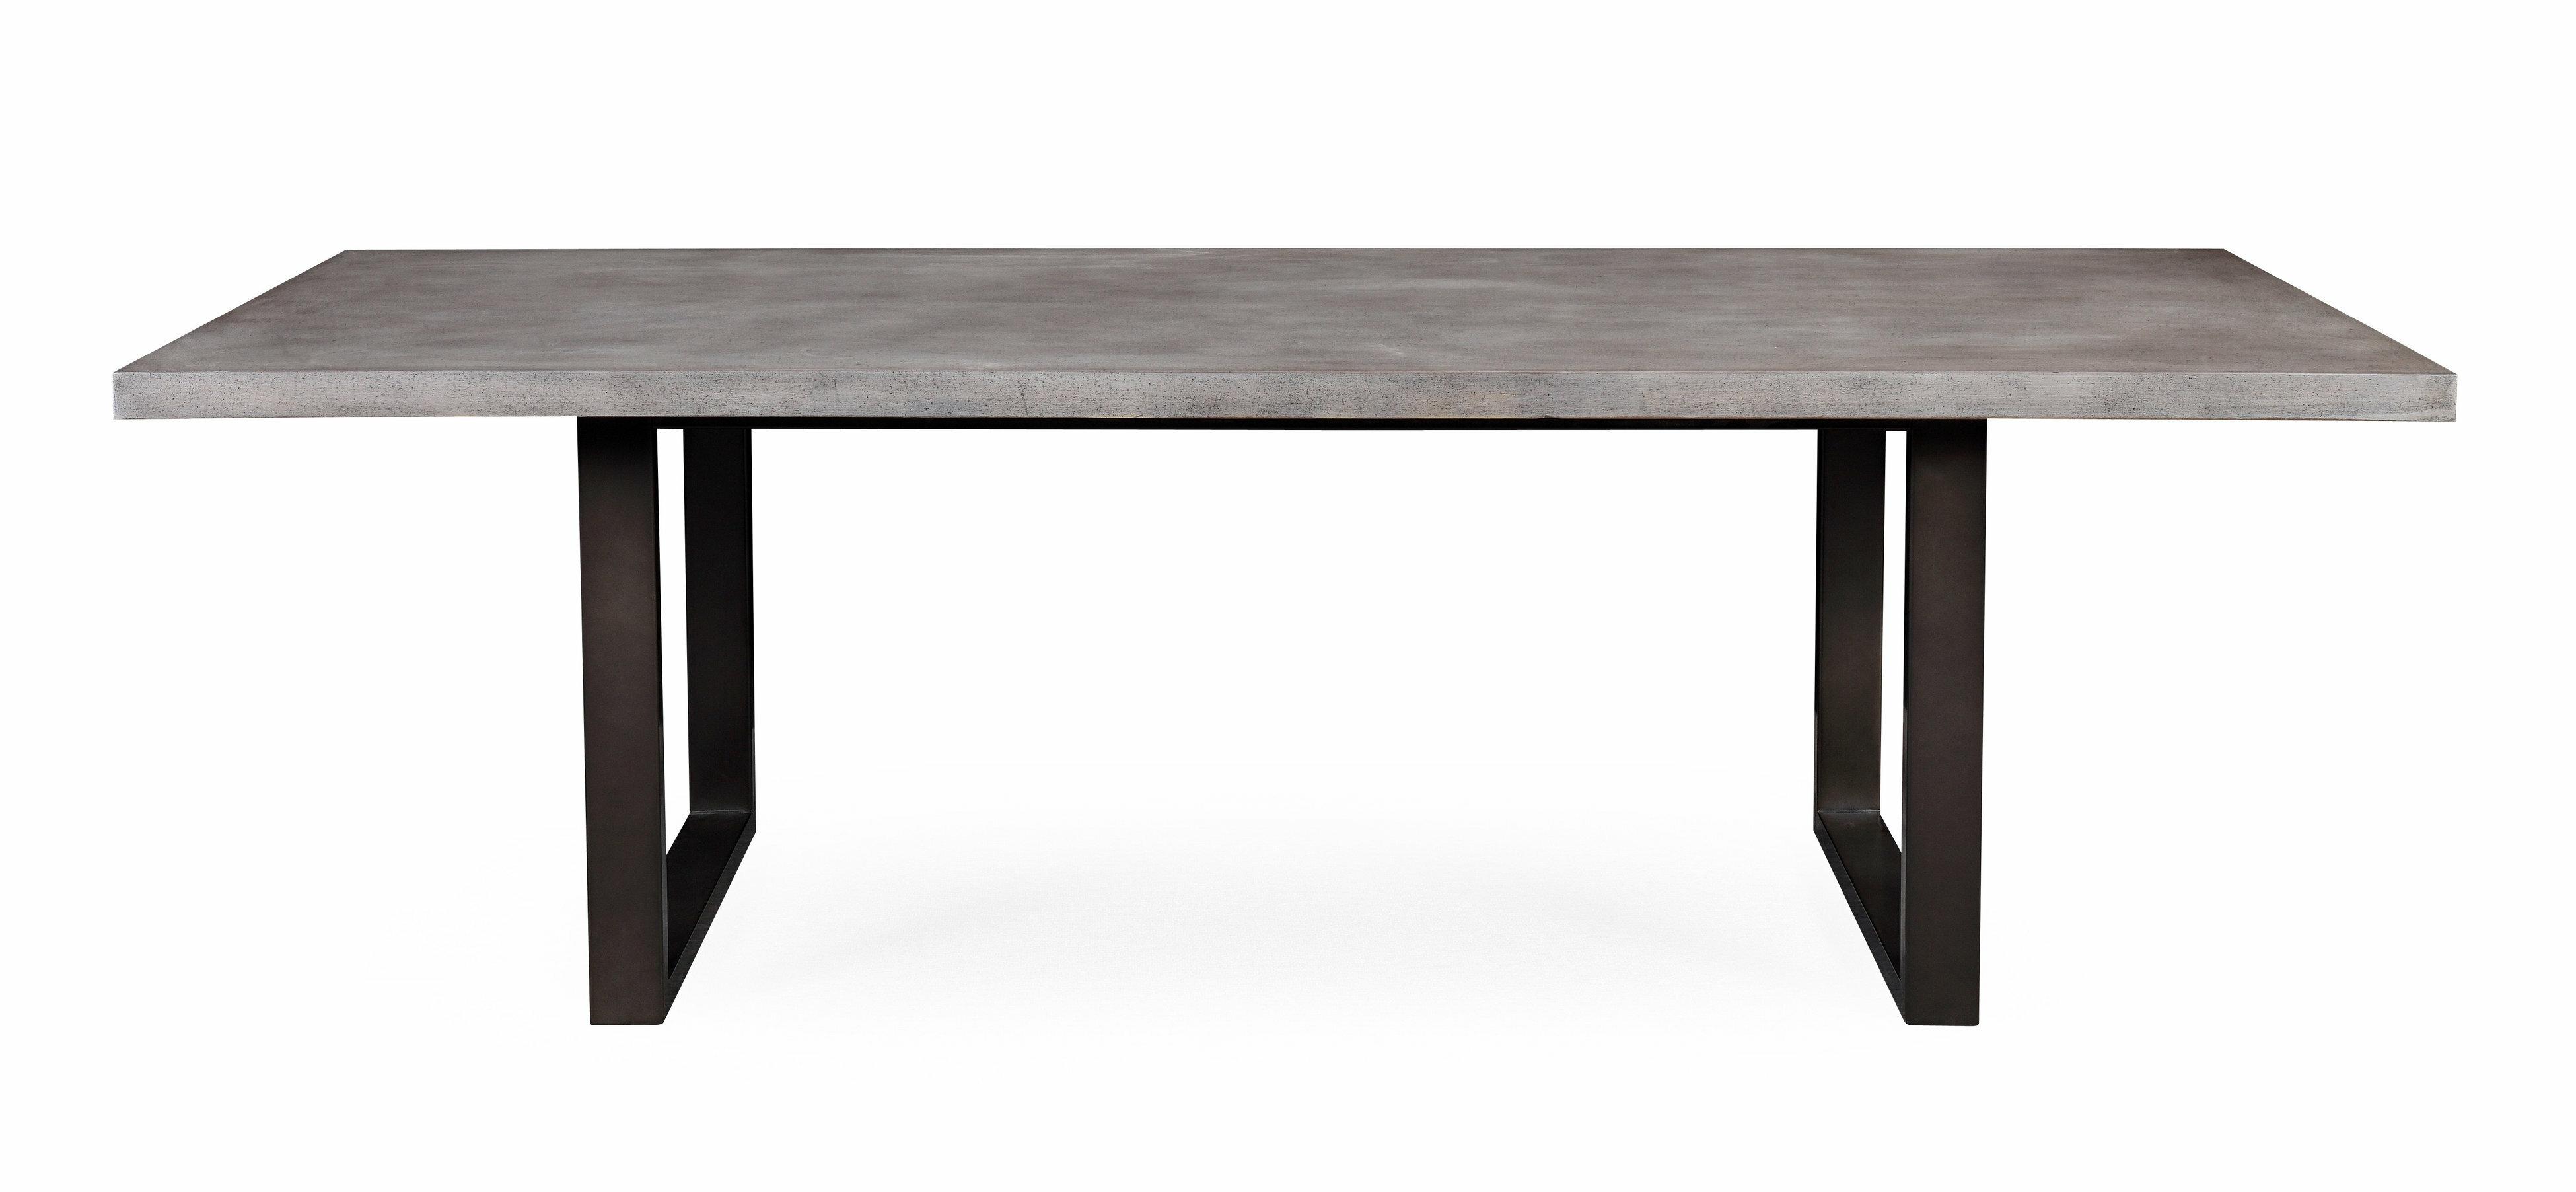 Carnarvon concrete dining table reviews allmodern